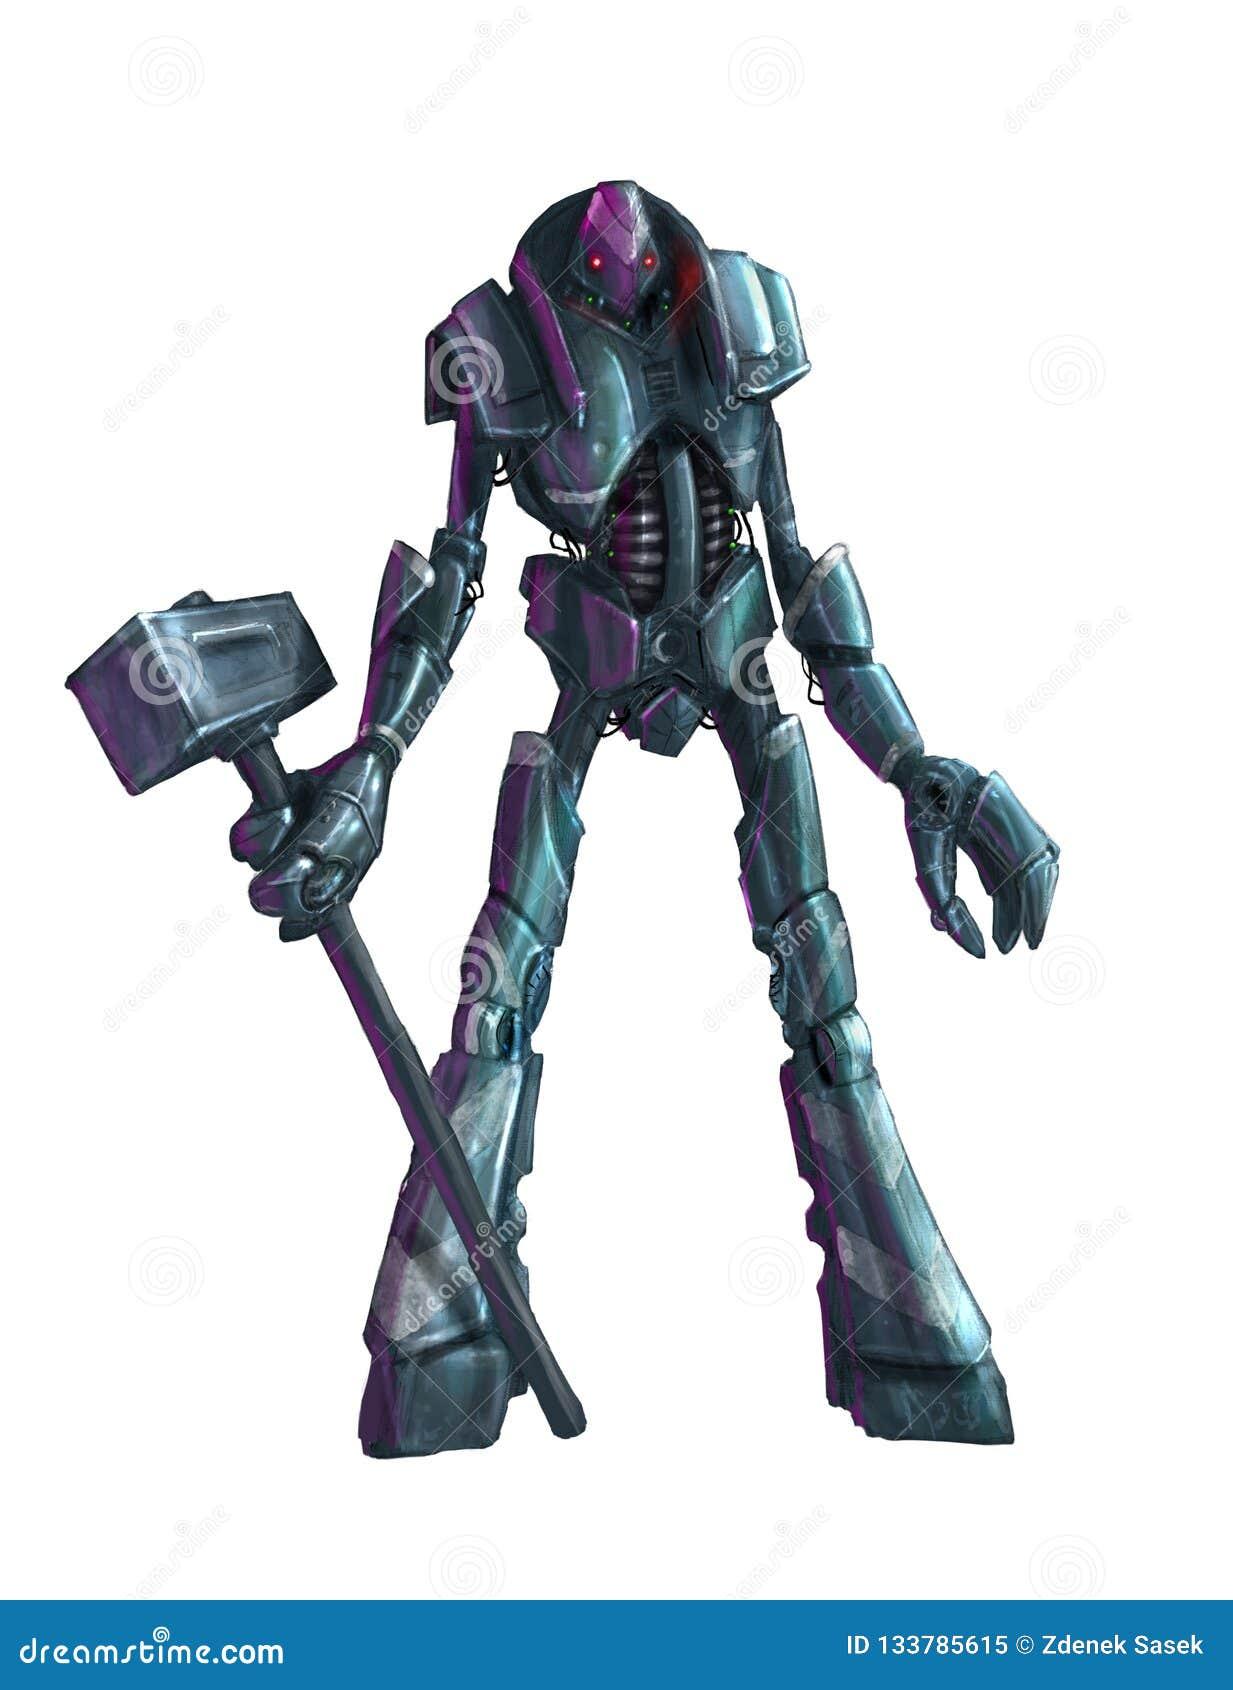 Konzept Art Painting des lokalisierten Humanoid Roboters mit Hammer